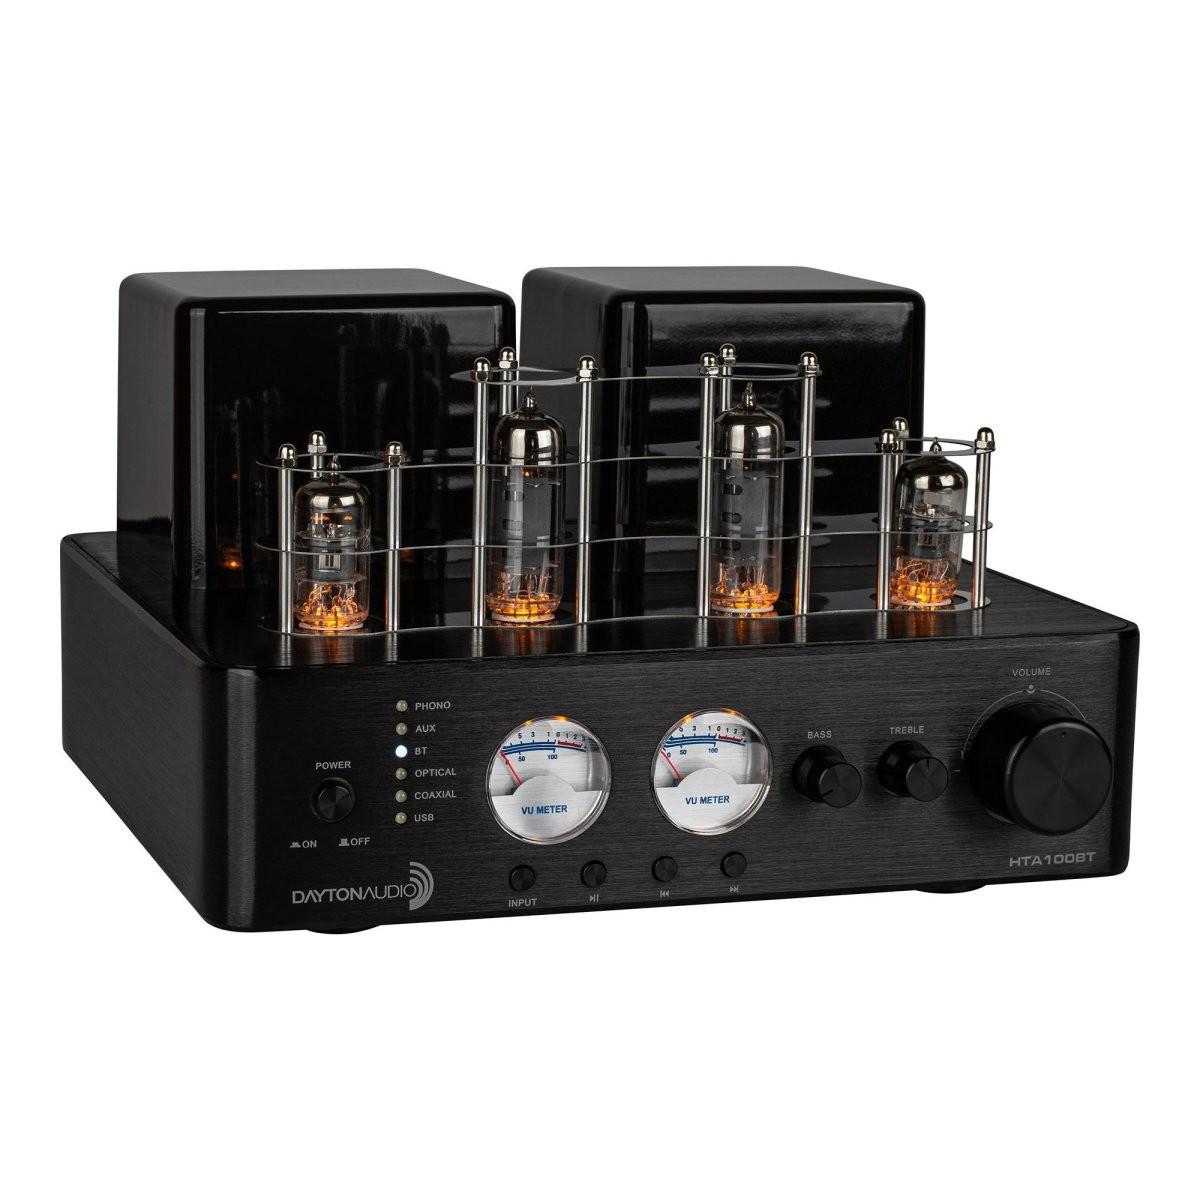 DAYTON AUDIO HTA100BT Amplificateur Hybride à Tube BT5.0 Phono 2x50W / 4 Ohm